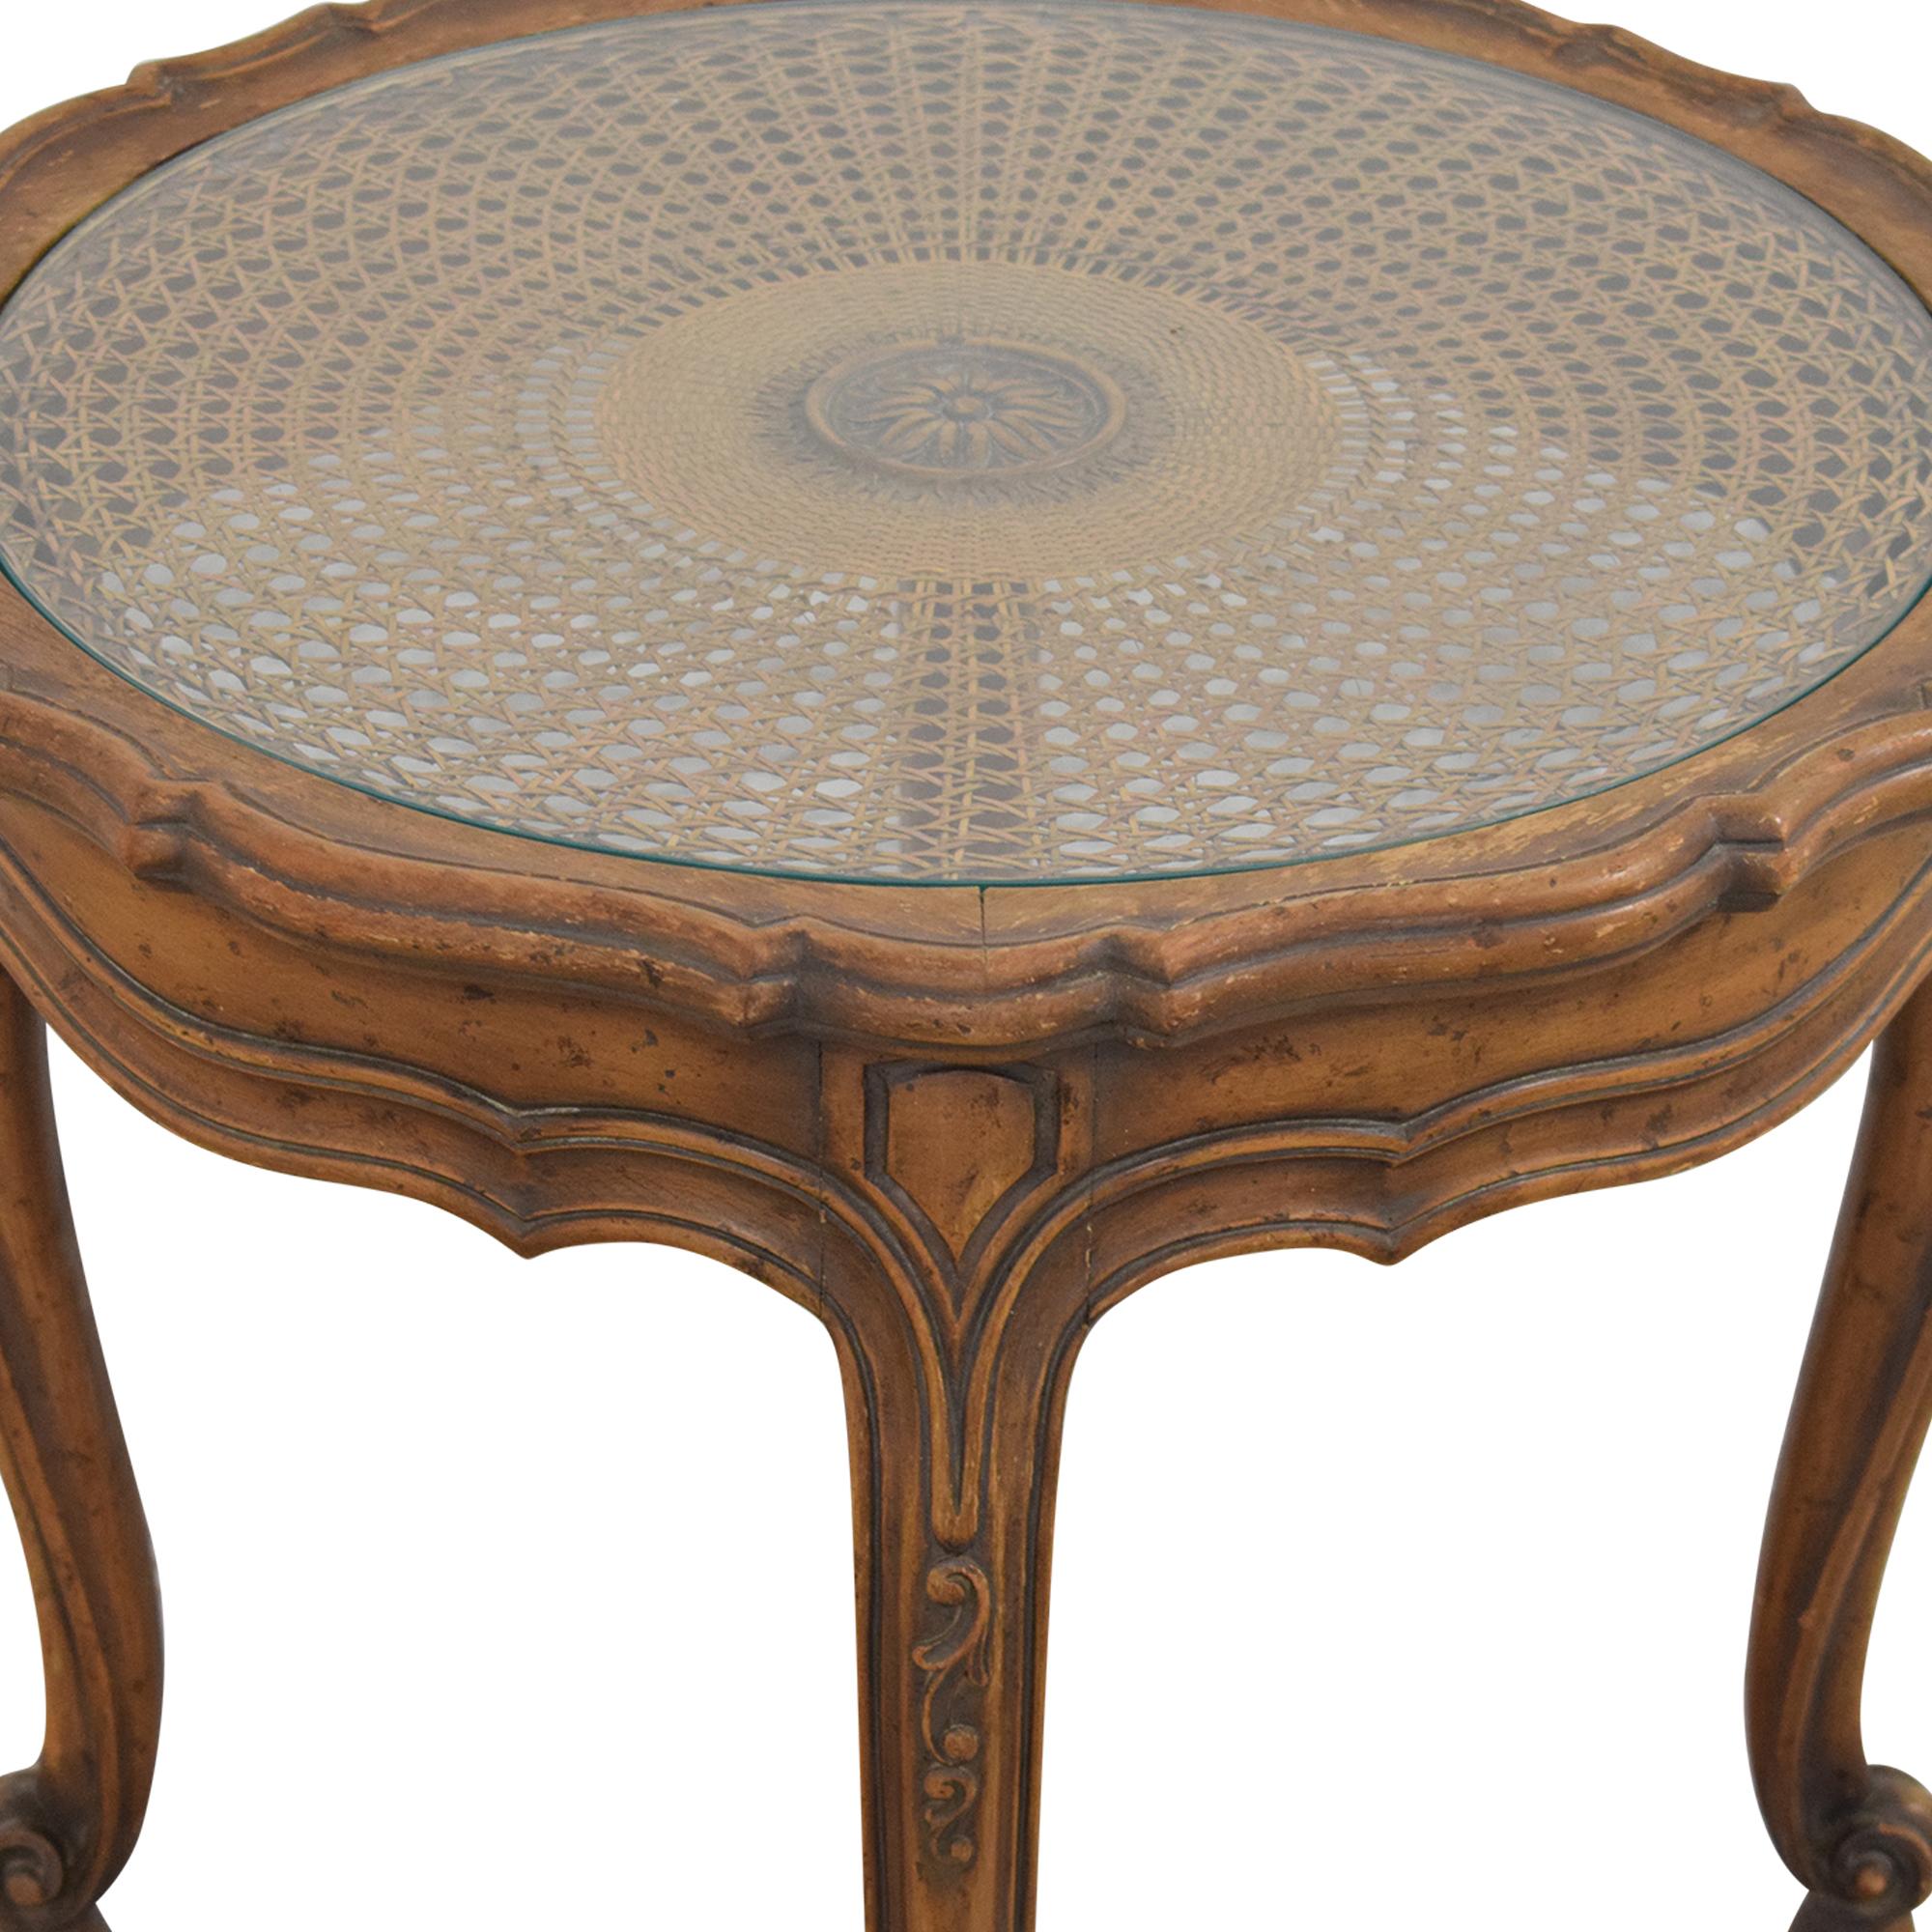 Decorative Italian End Table for sale